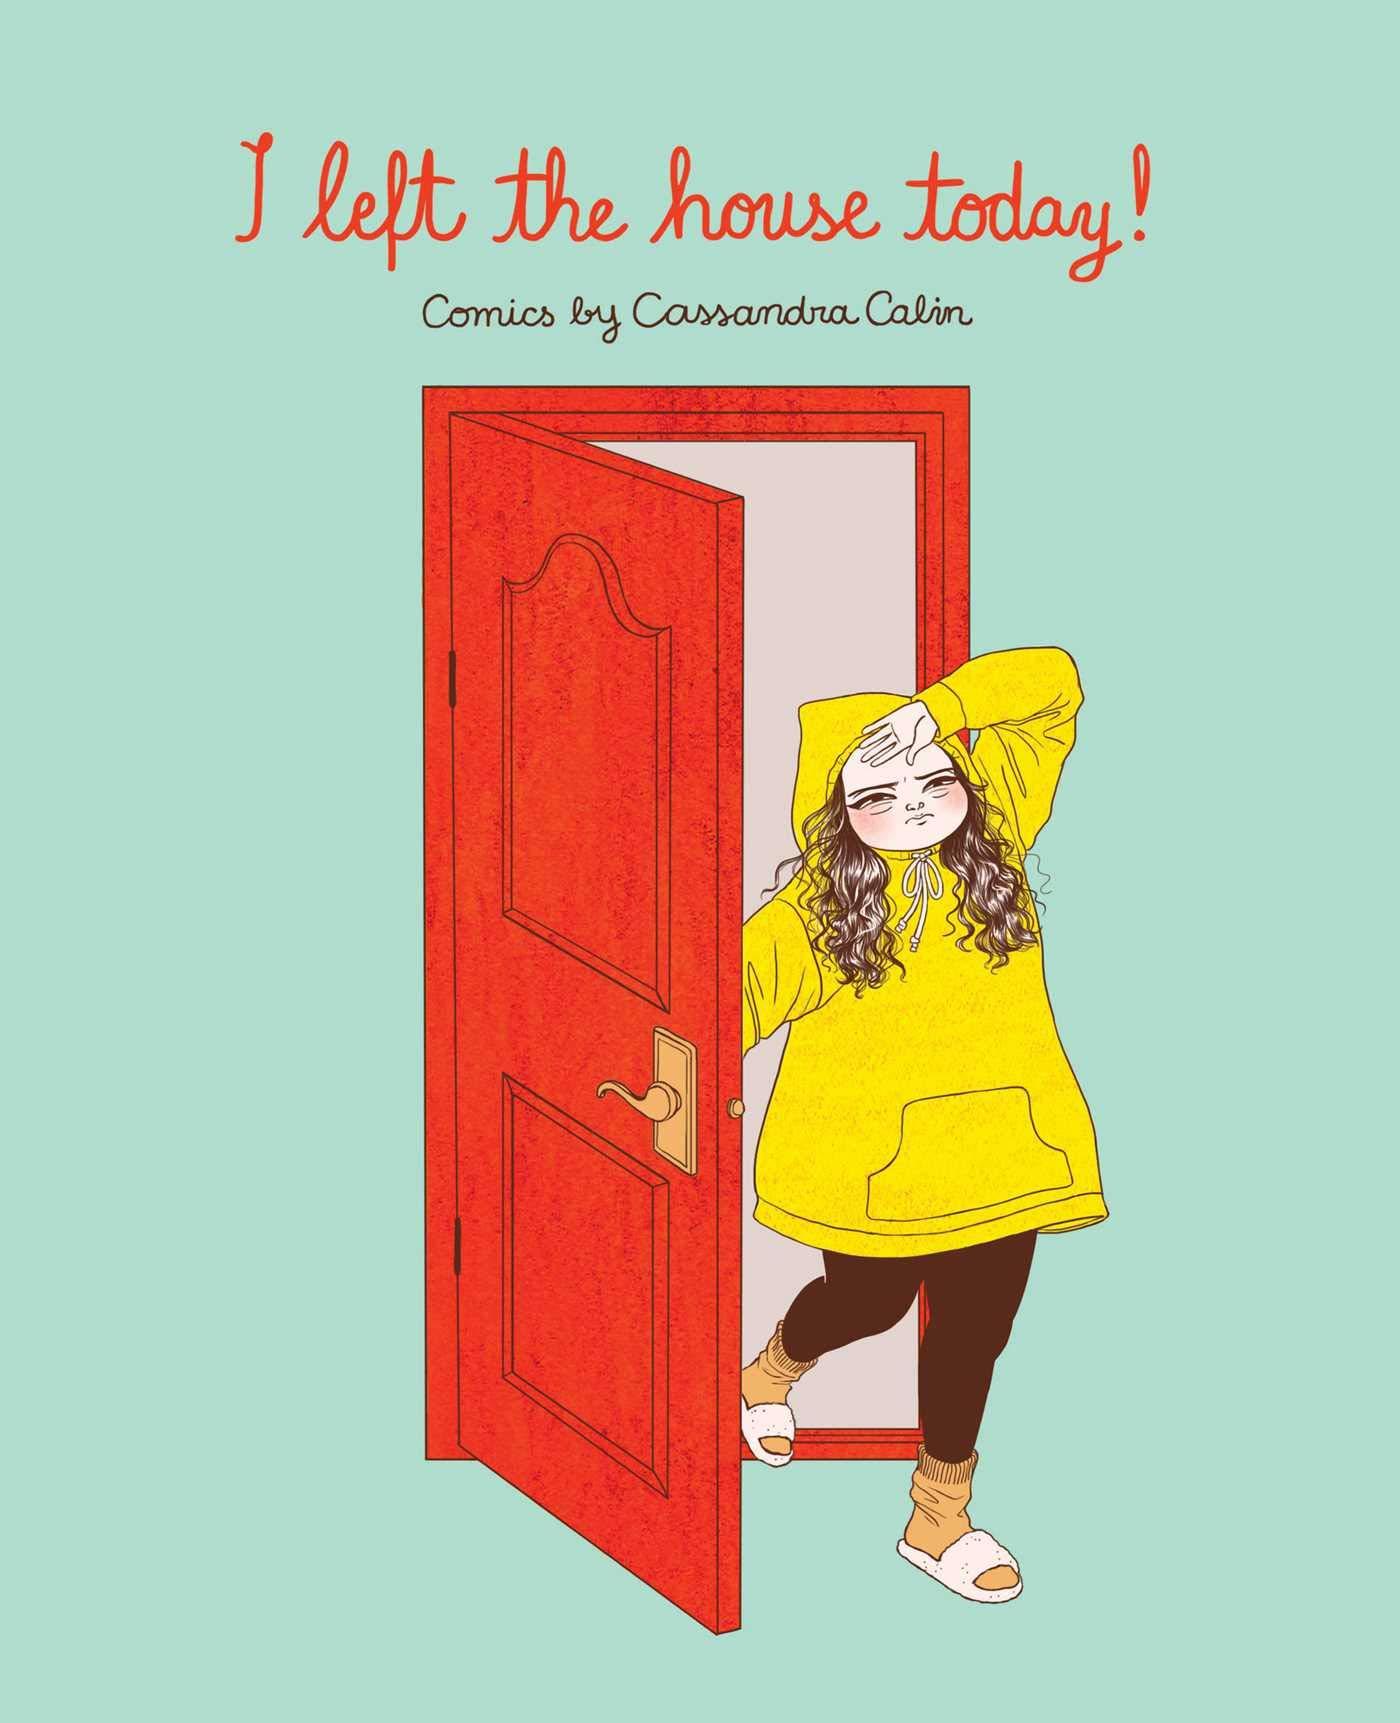 I Left the House Today!: Calin, Cassandra: 9781524855574: Amazon.com: Books